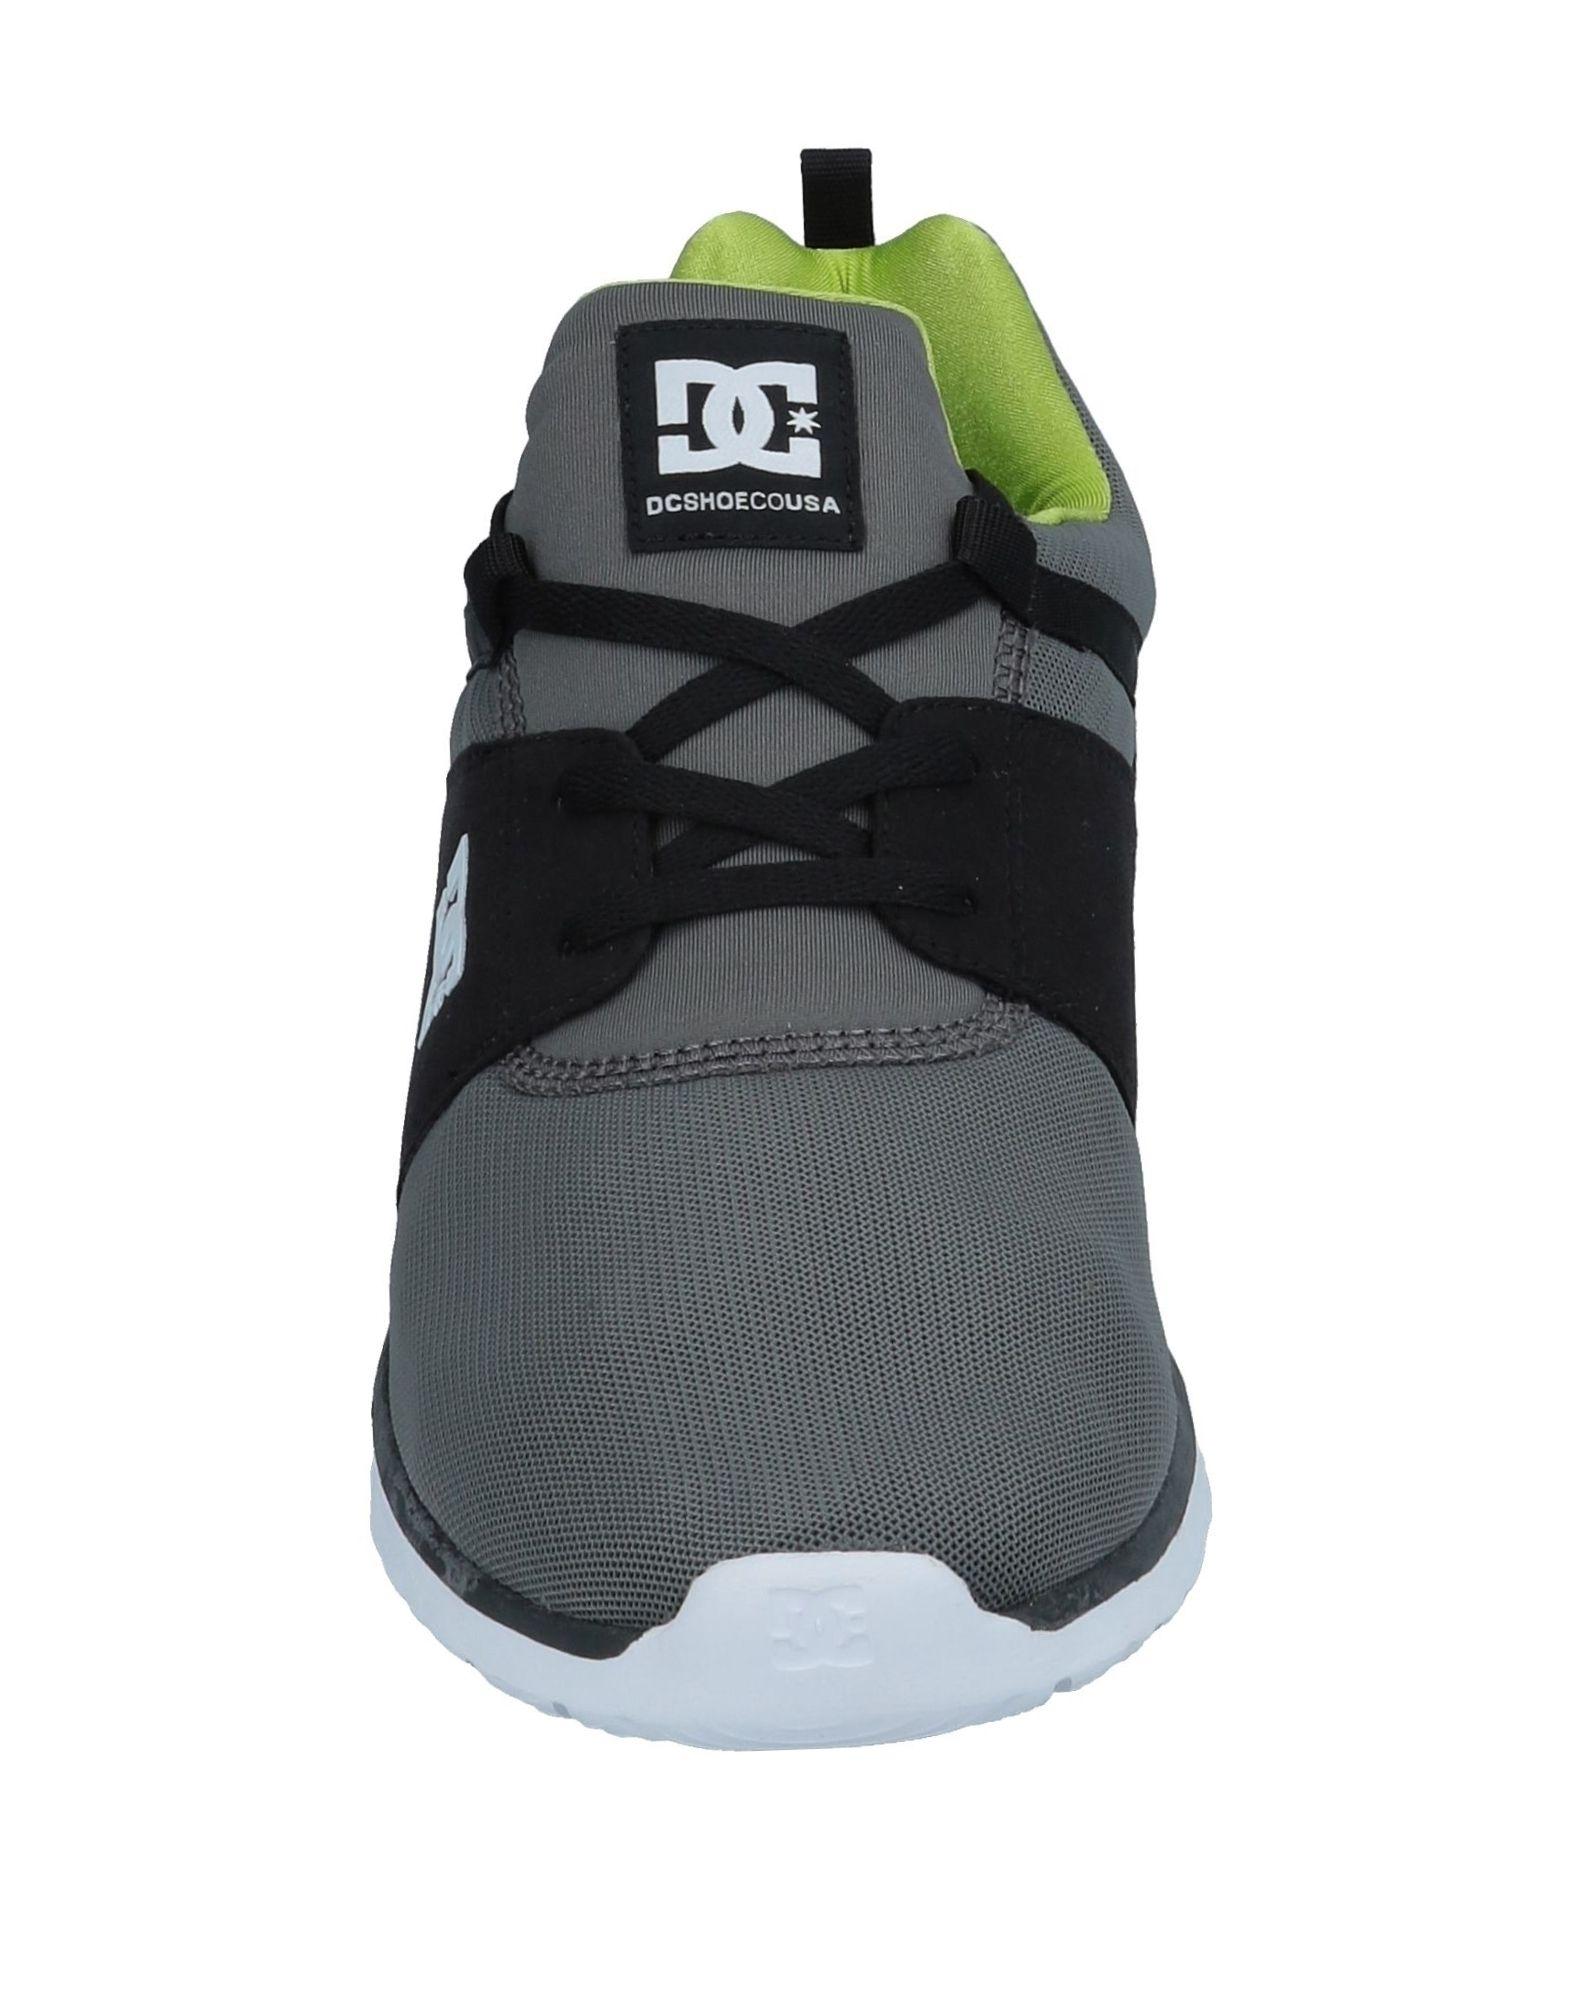 Rabatt Sneakers echte Schuhe Dc Shoecousa Sneakers Rabatt Herren  11556068KU e8626c